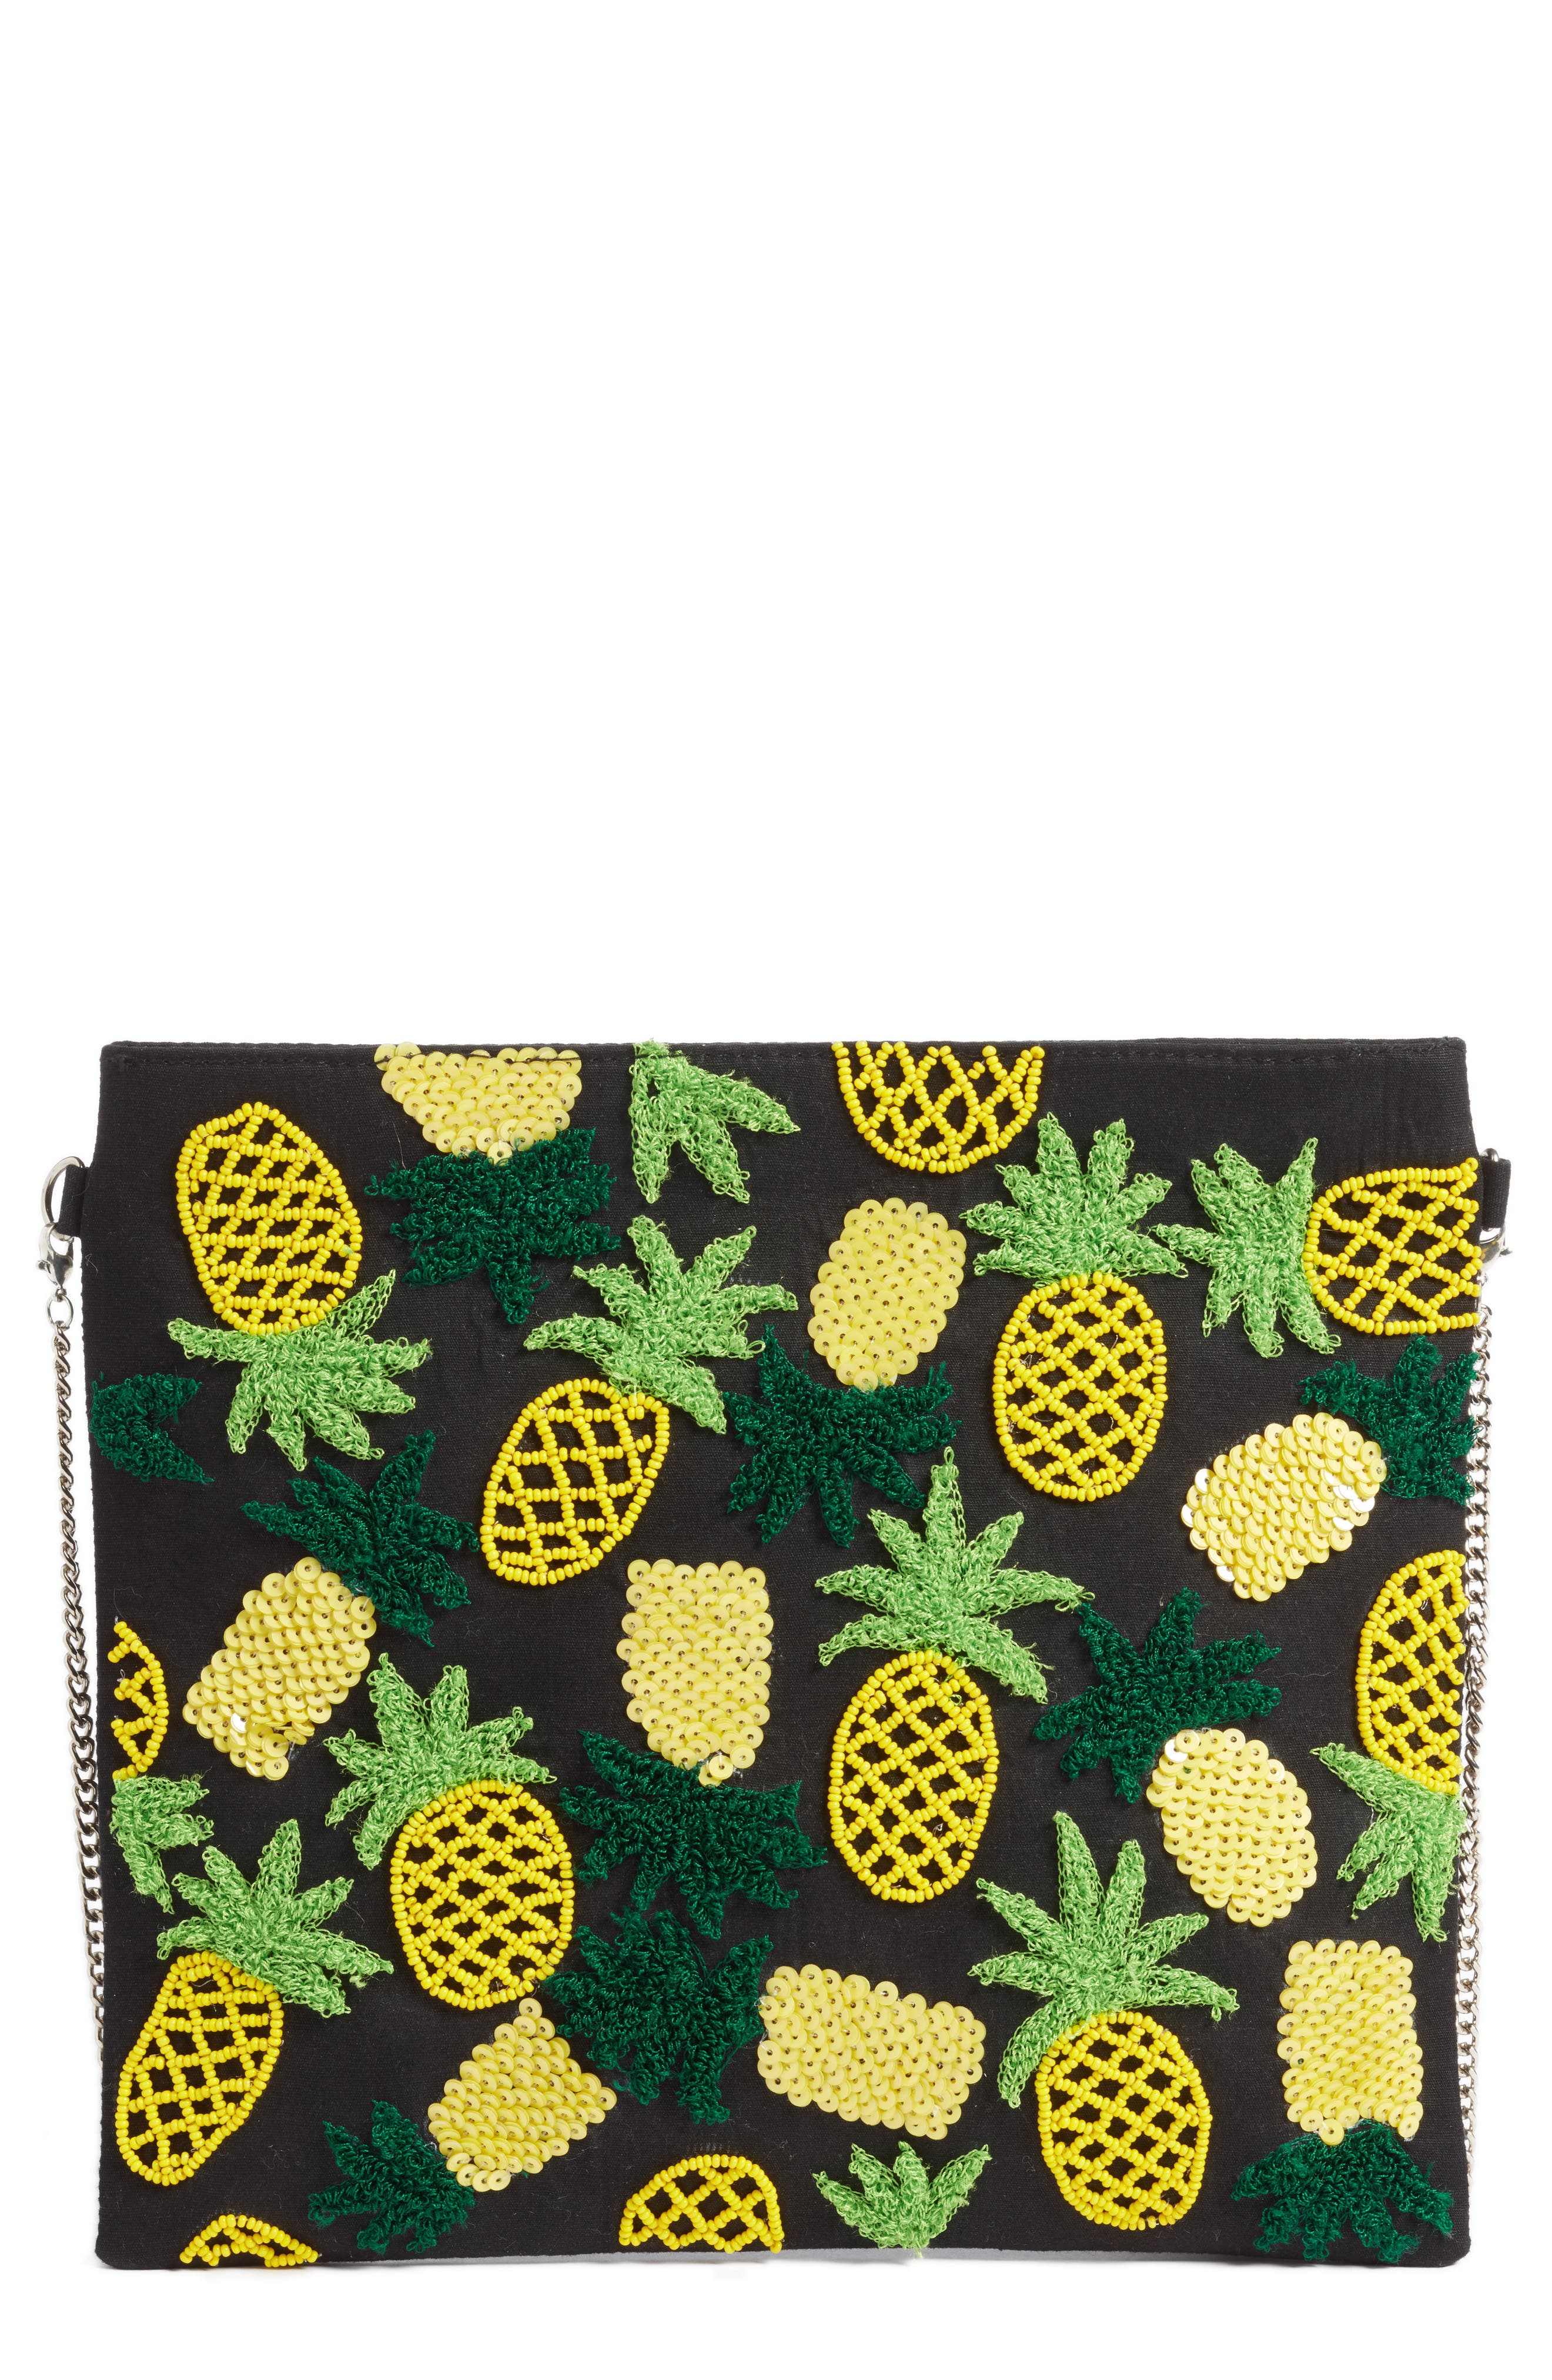 AREA STARS Pineapple Crossbody Bag - Black